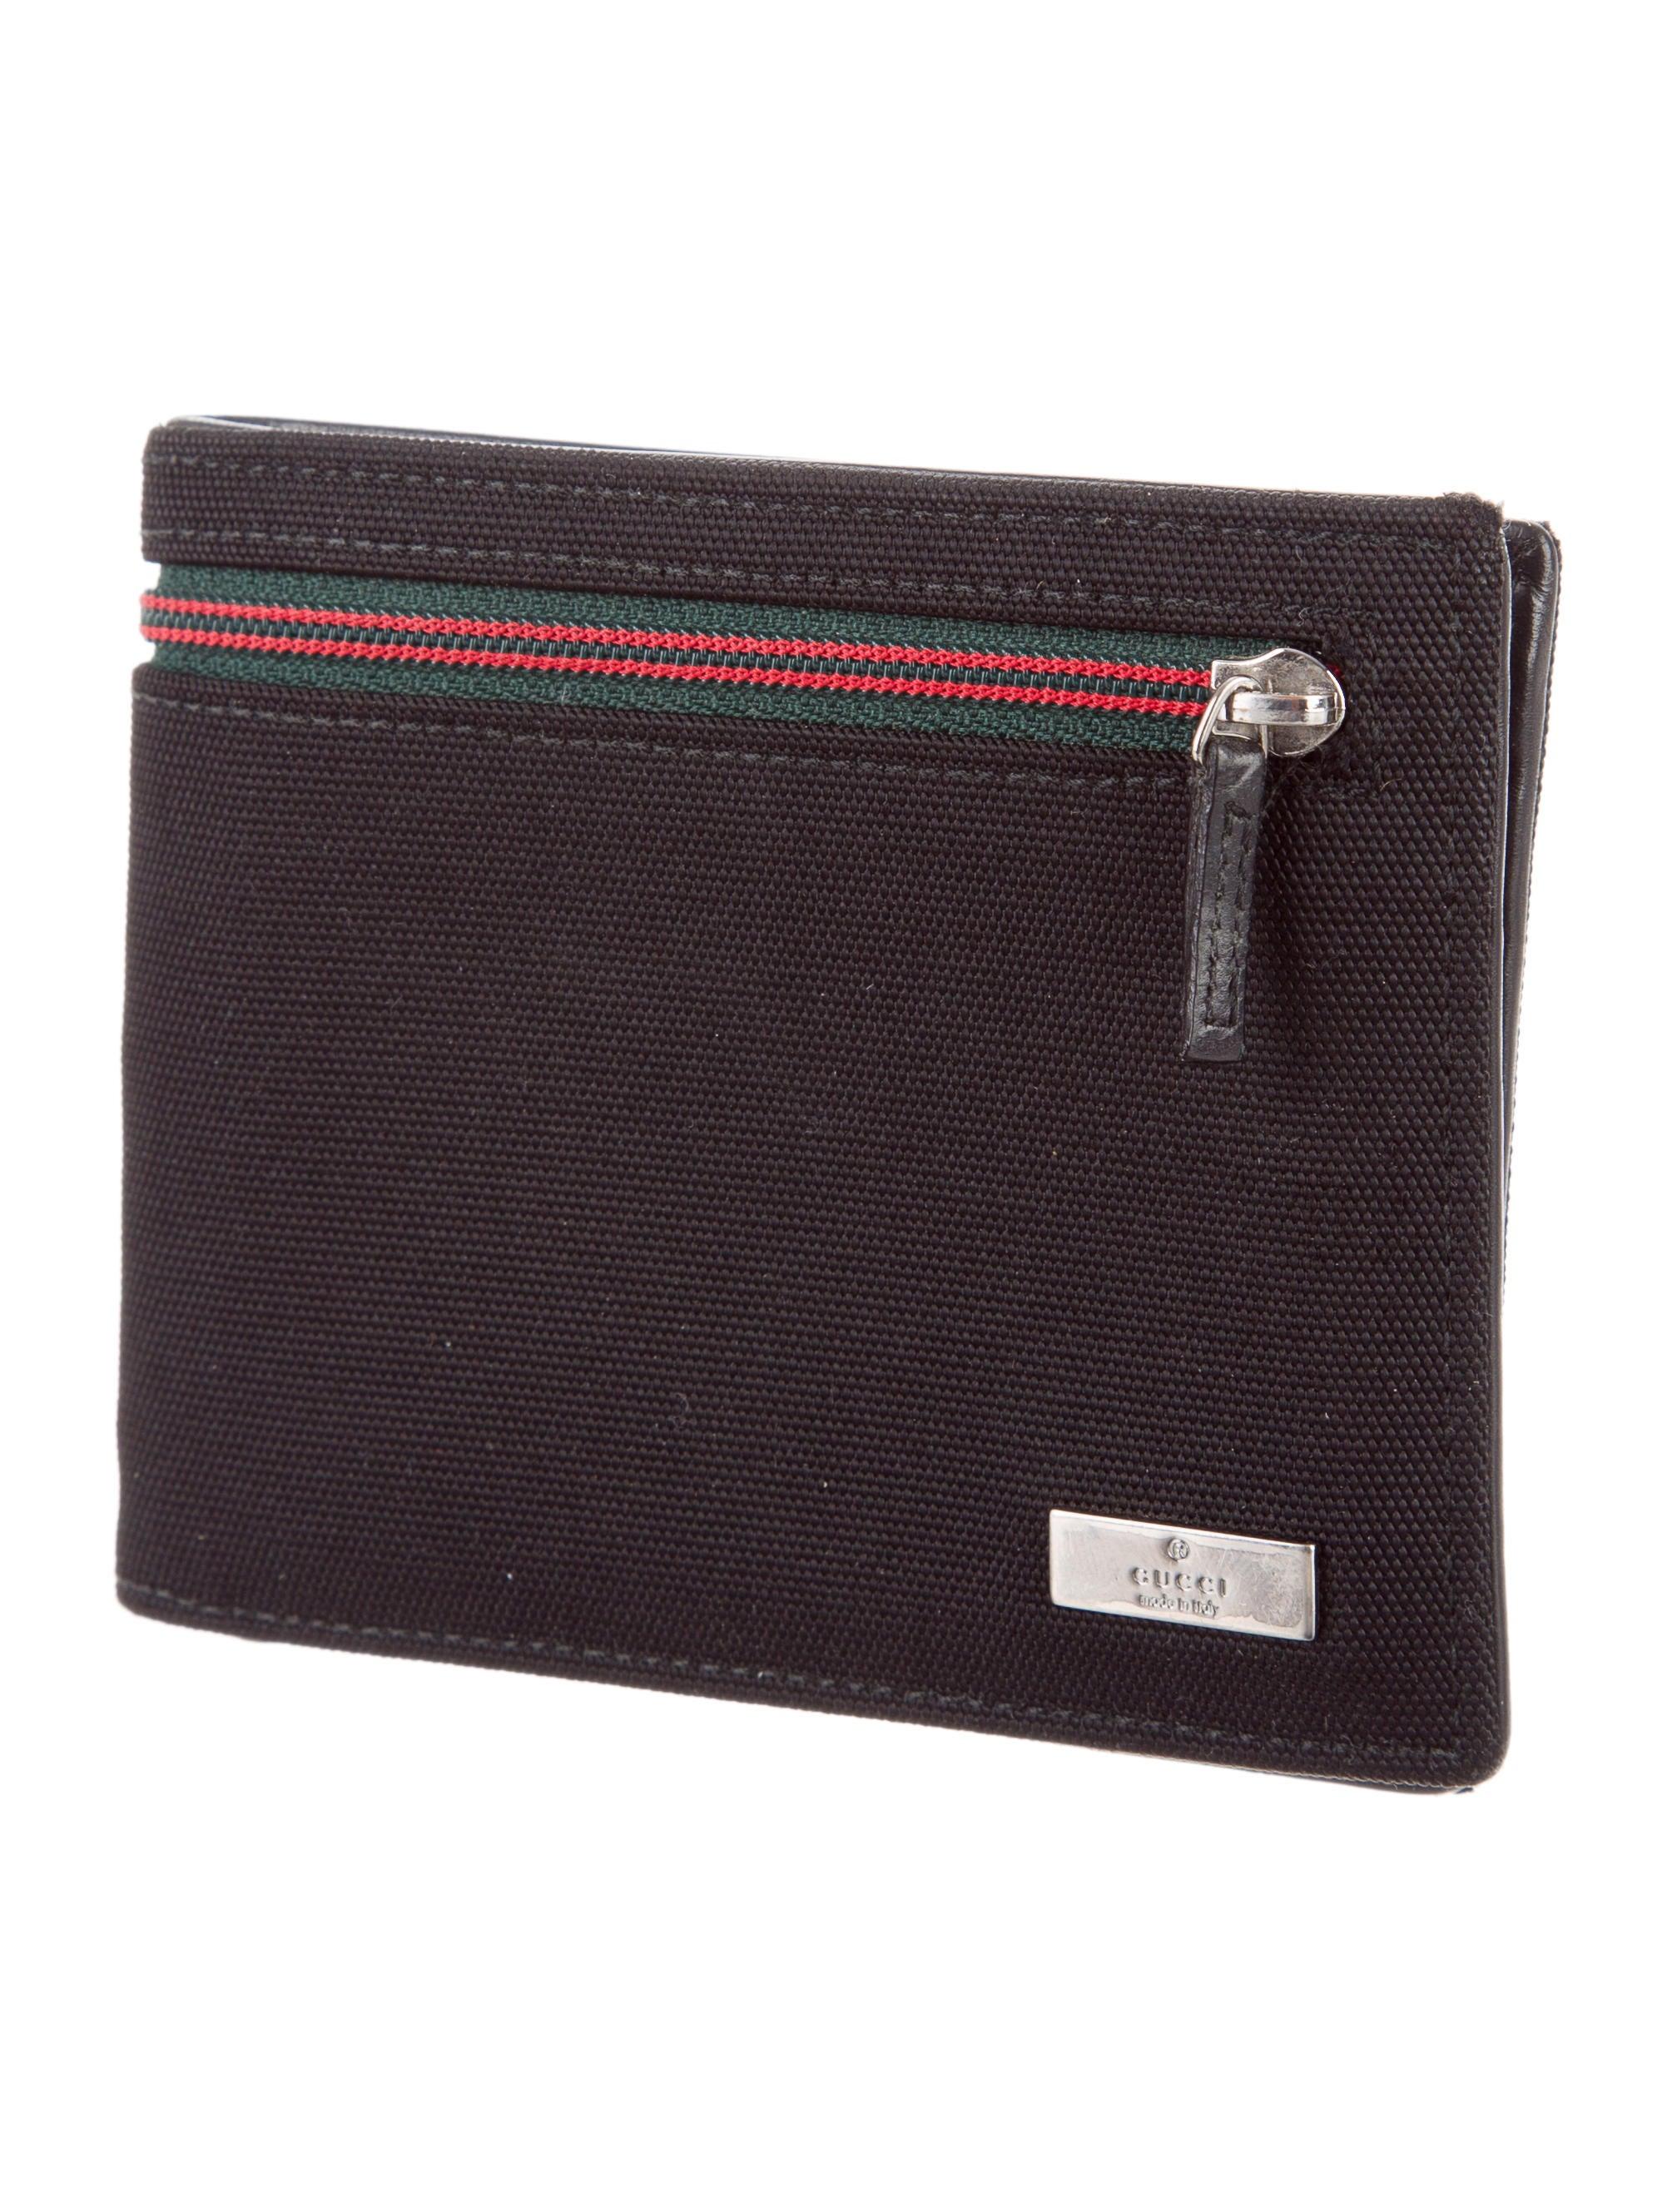 Black Nylon Wallet 46